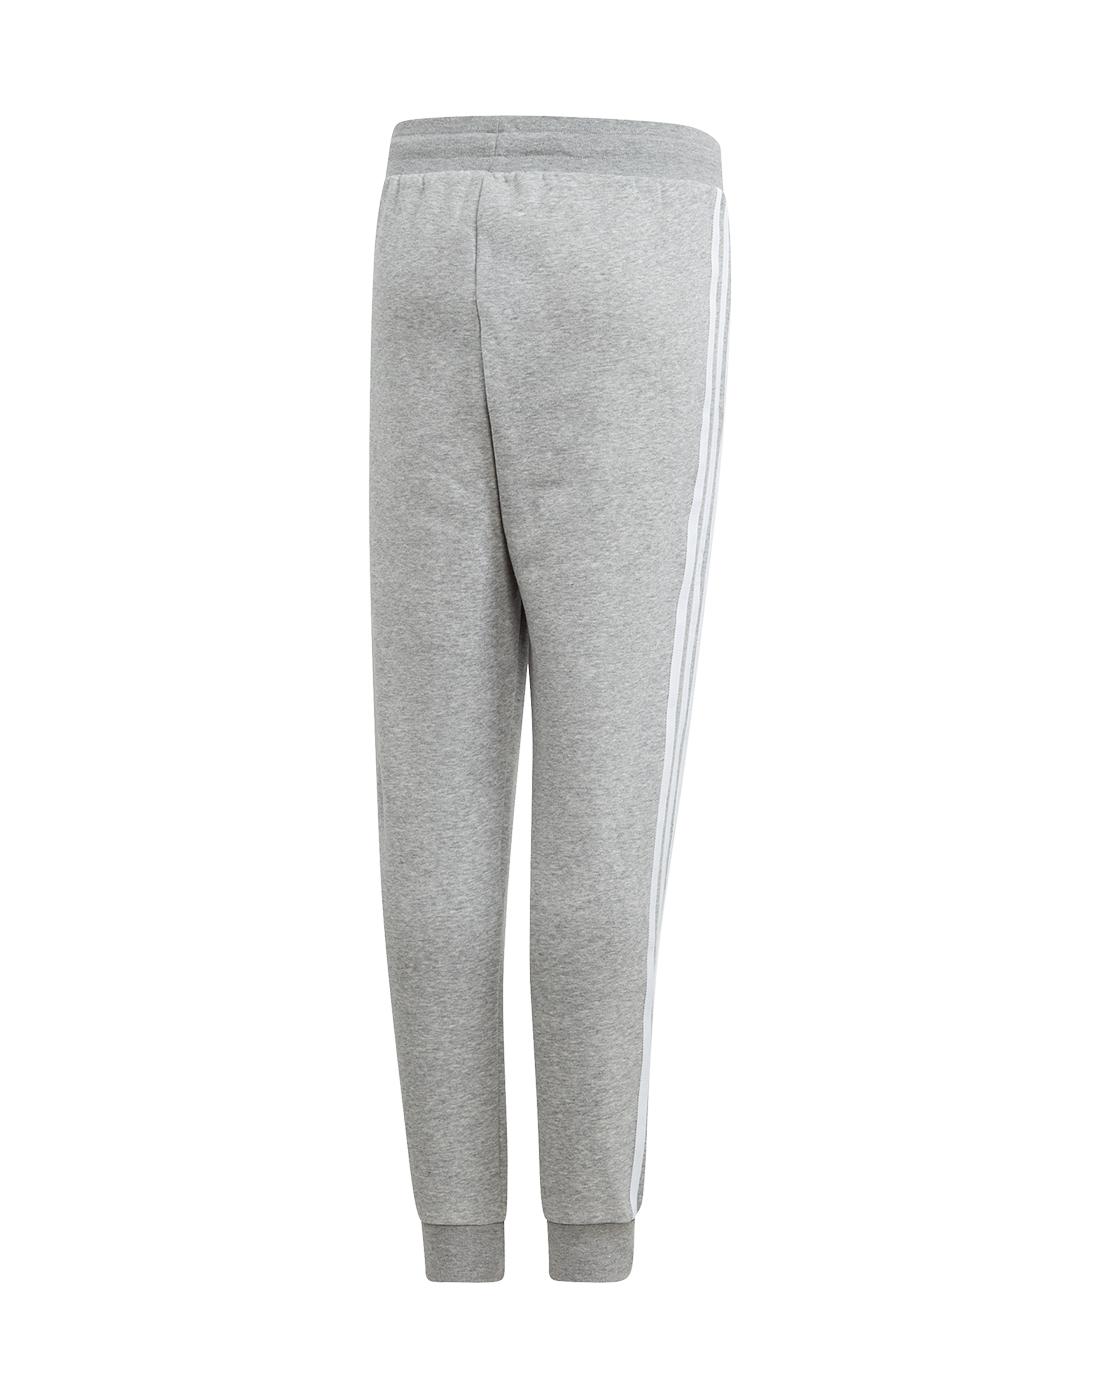 on sale 4d724 749f1 boys adidas originals trefoil jogger pants